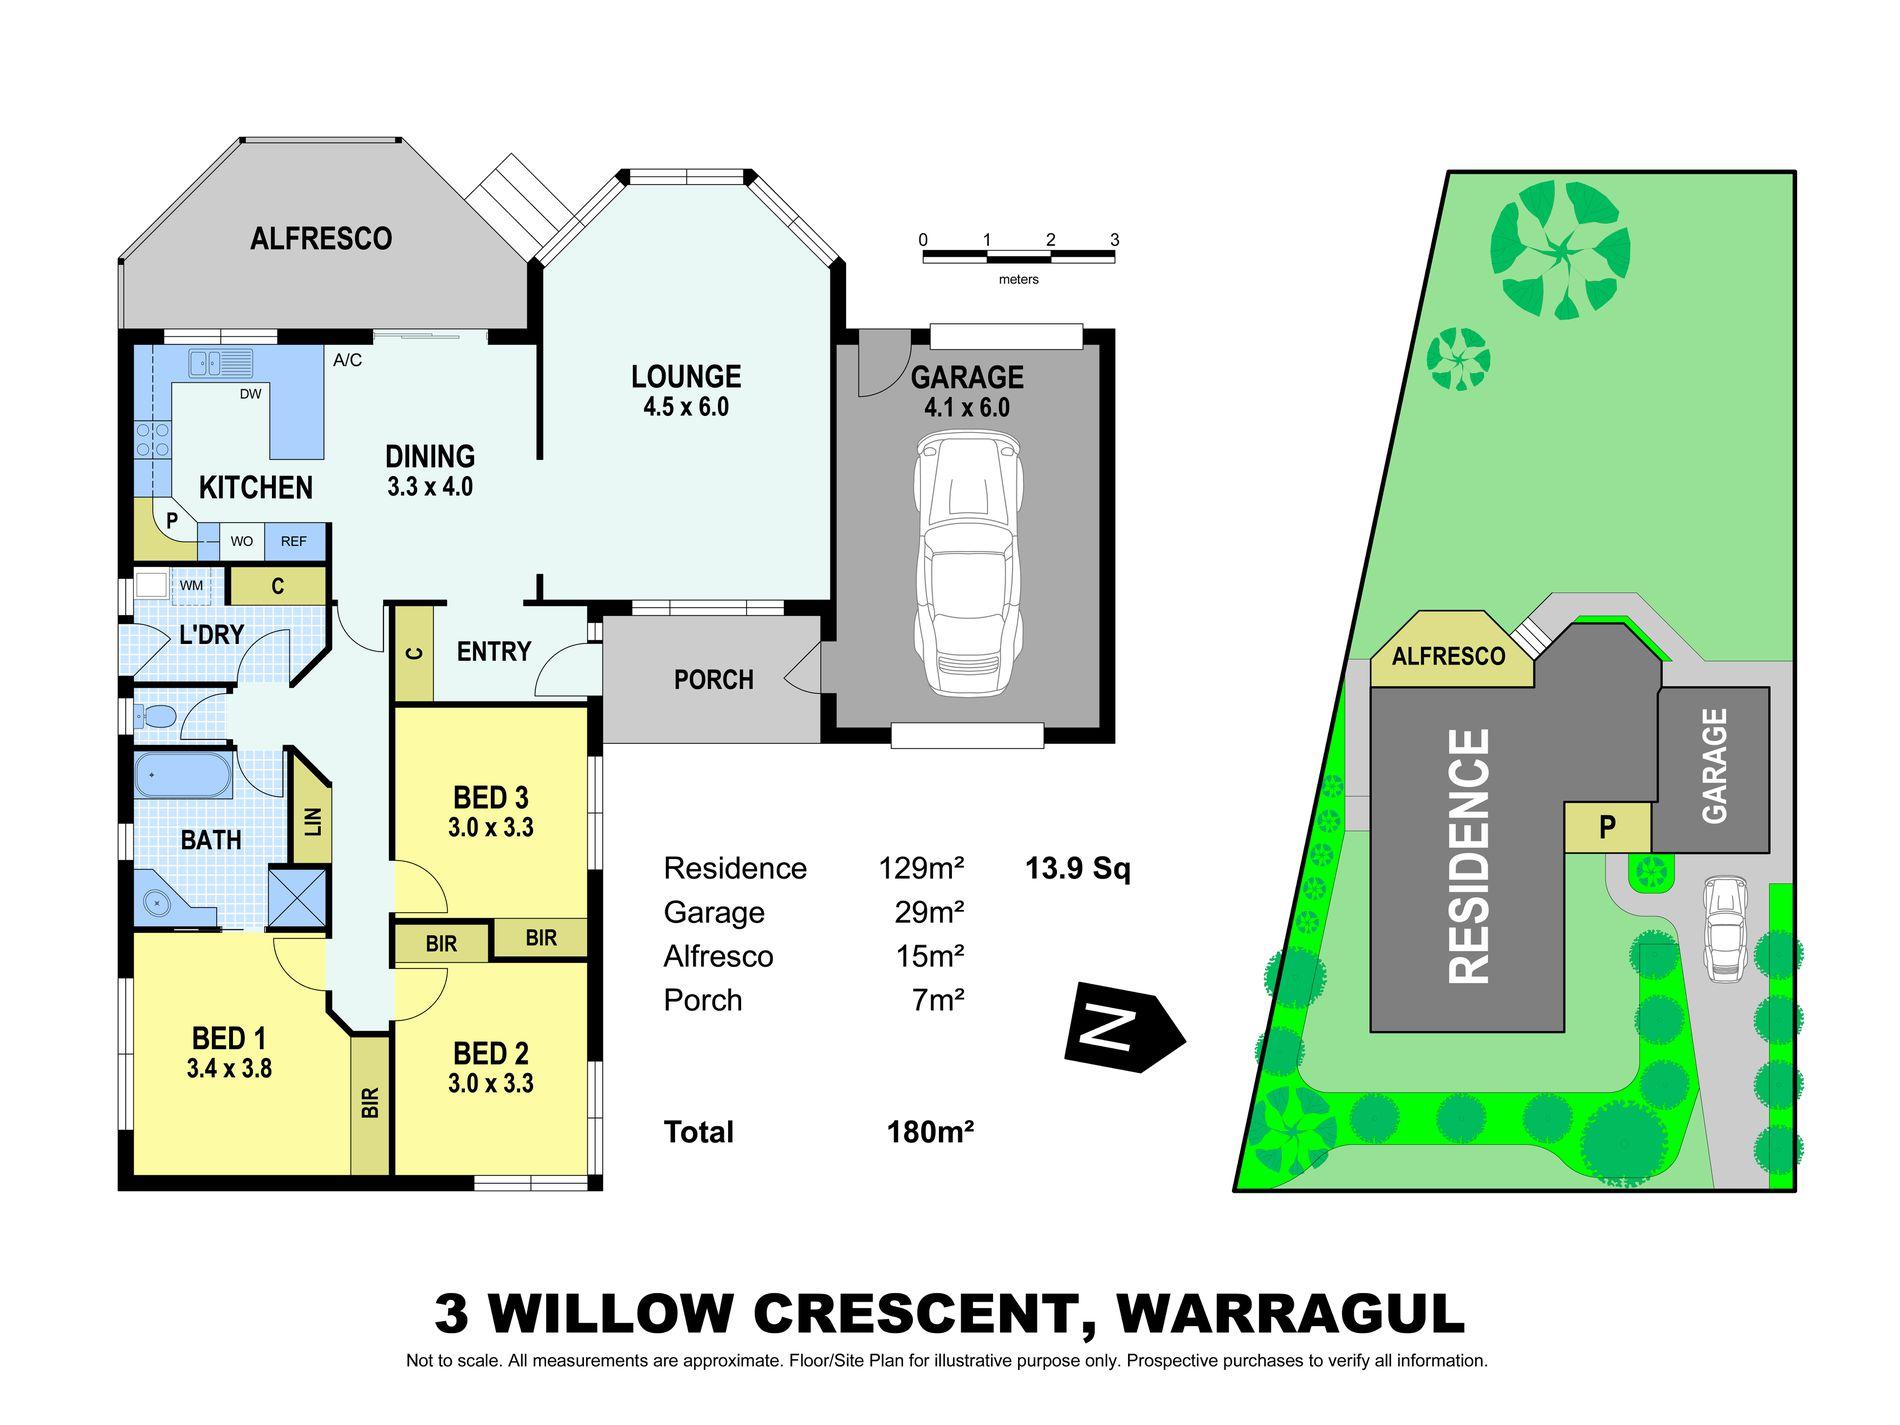 3 Willow Crescent, Warragul